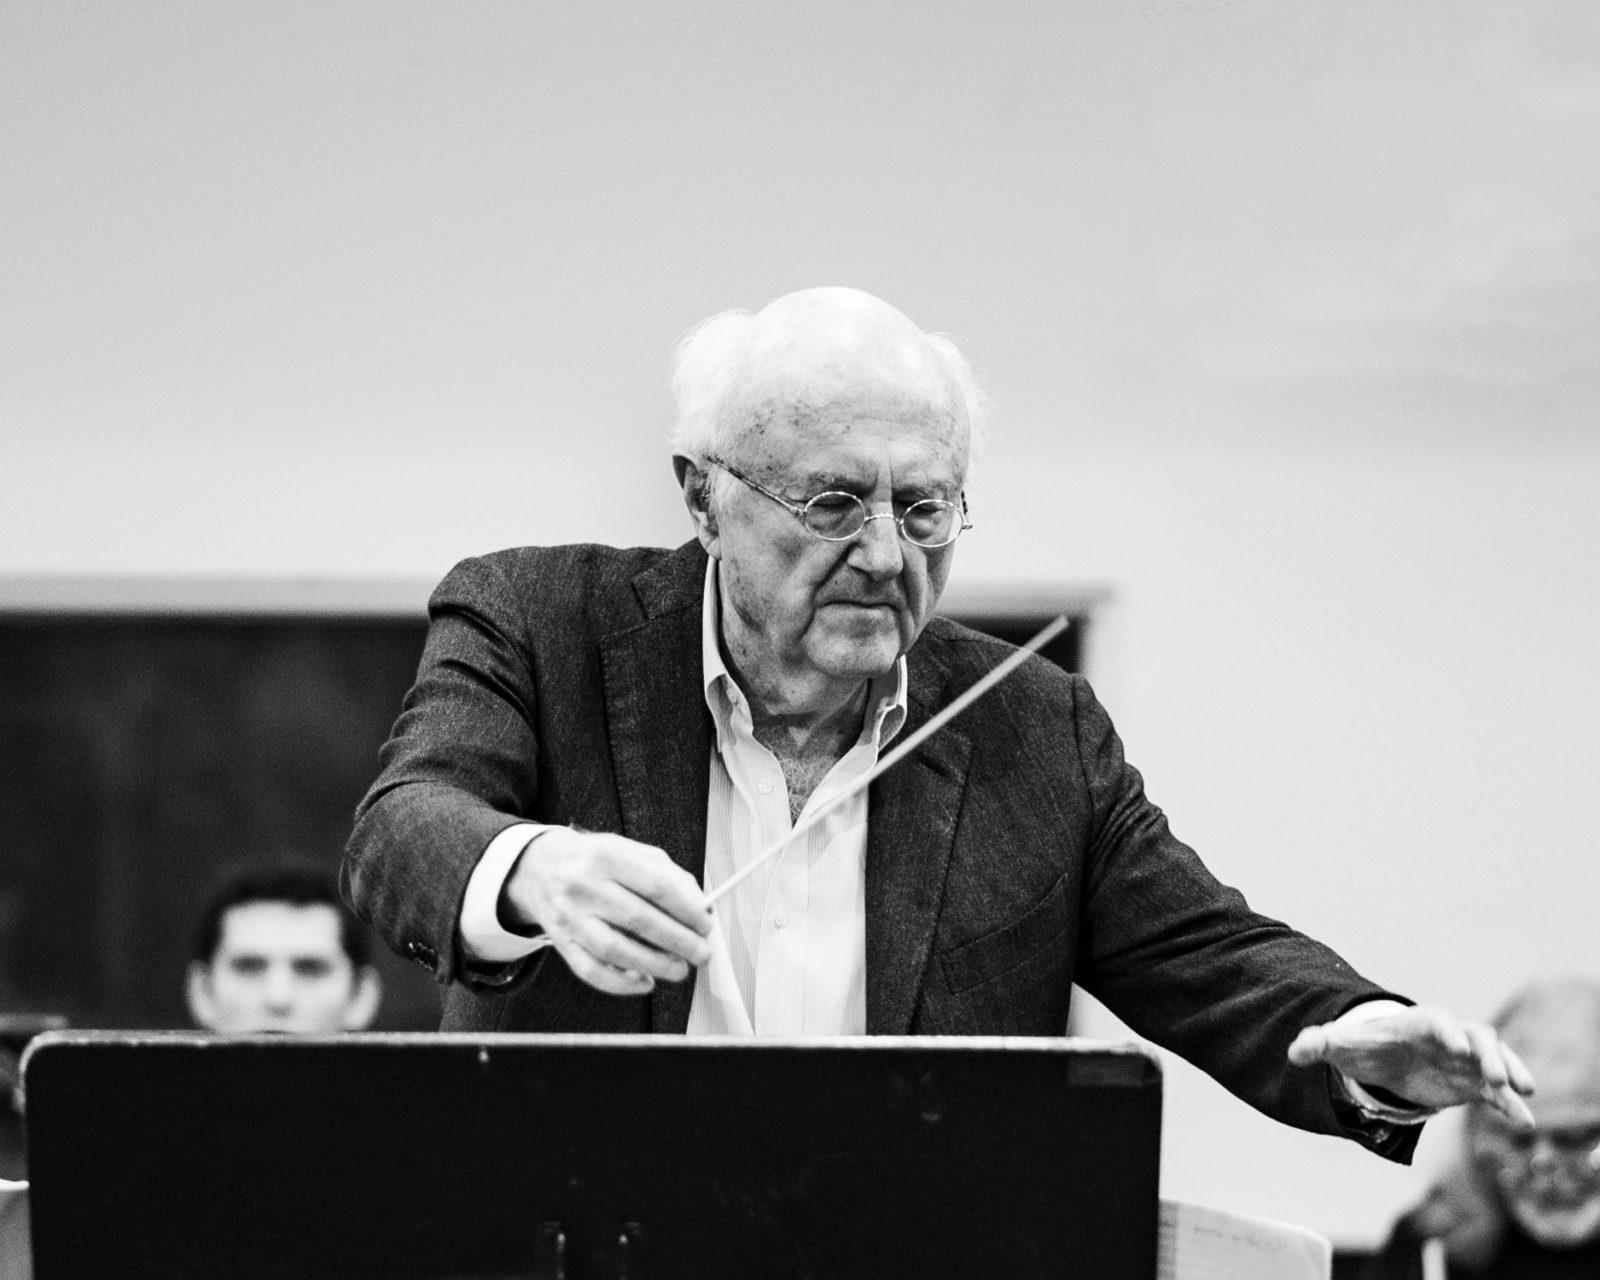 Vladimir Cosma